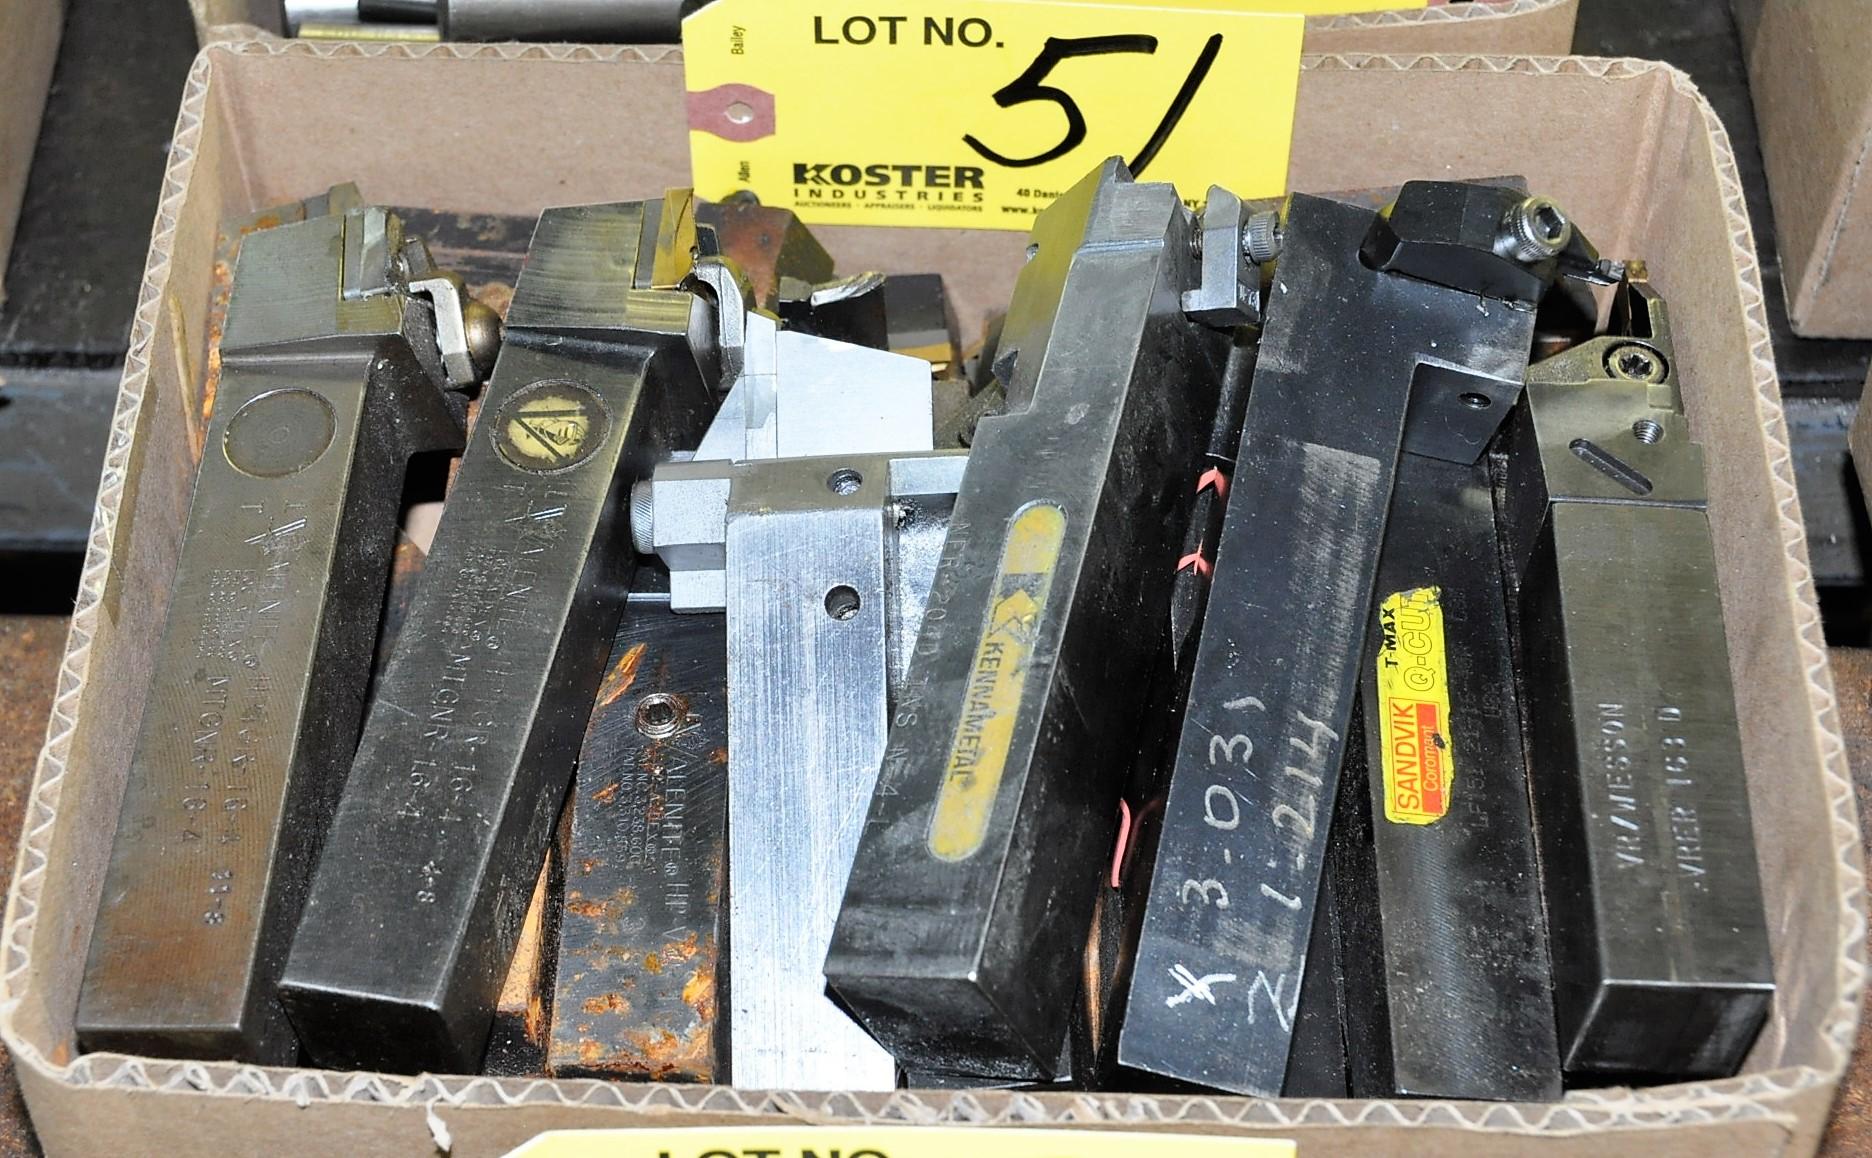 Lot 51 - INSERT TYPE BORING BARS IN (1) BOX